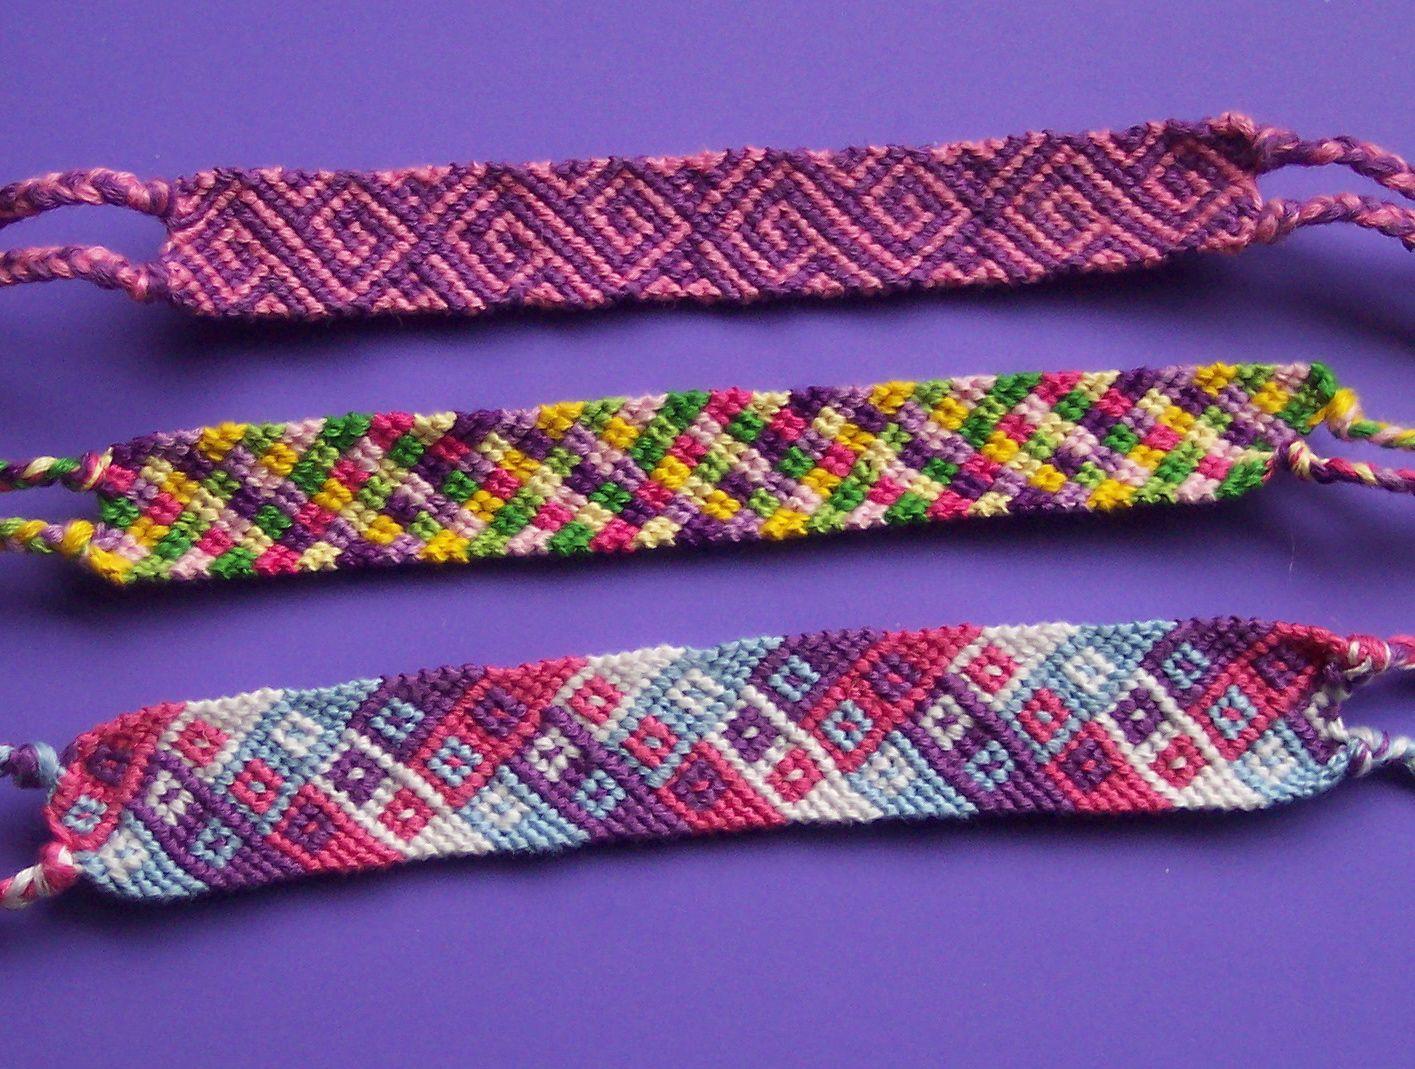 Friendship Bracelets  Friendship_bracelets_15_by_panther01228g